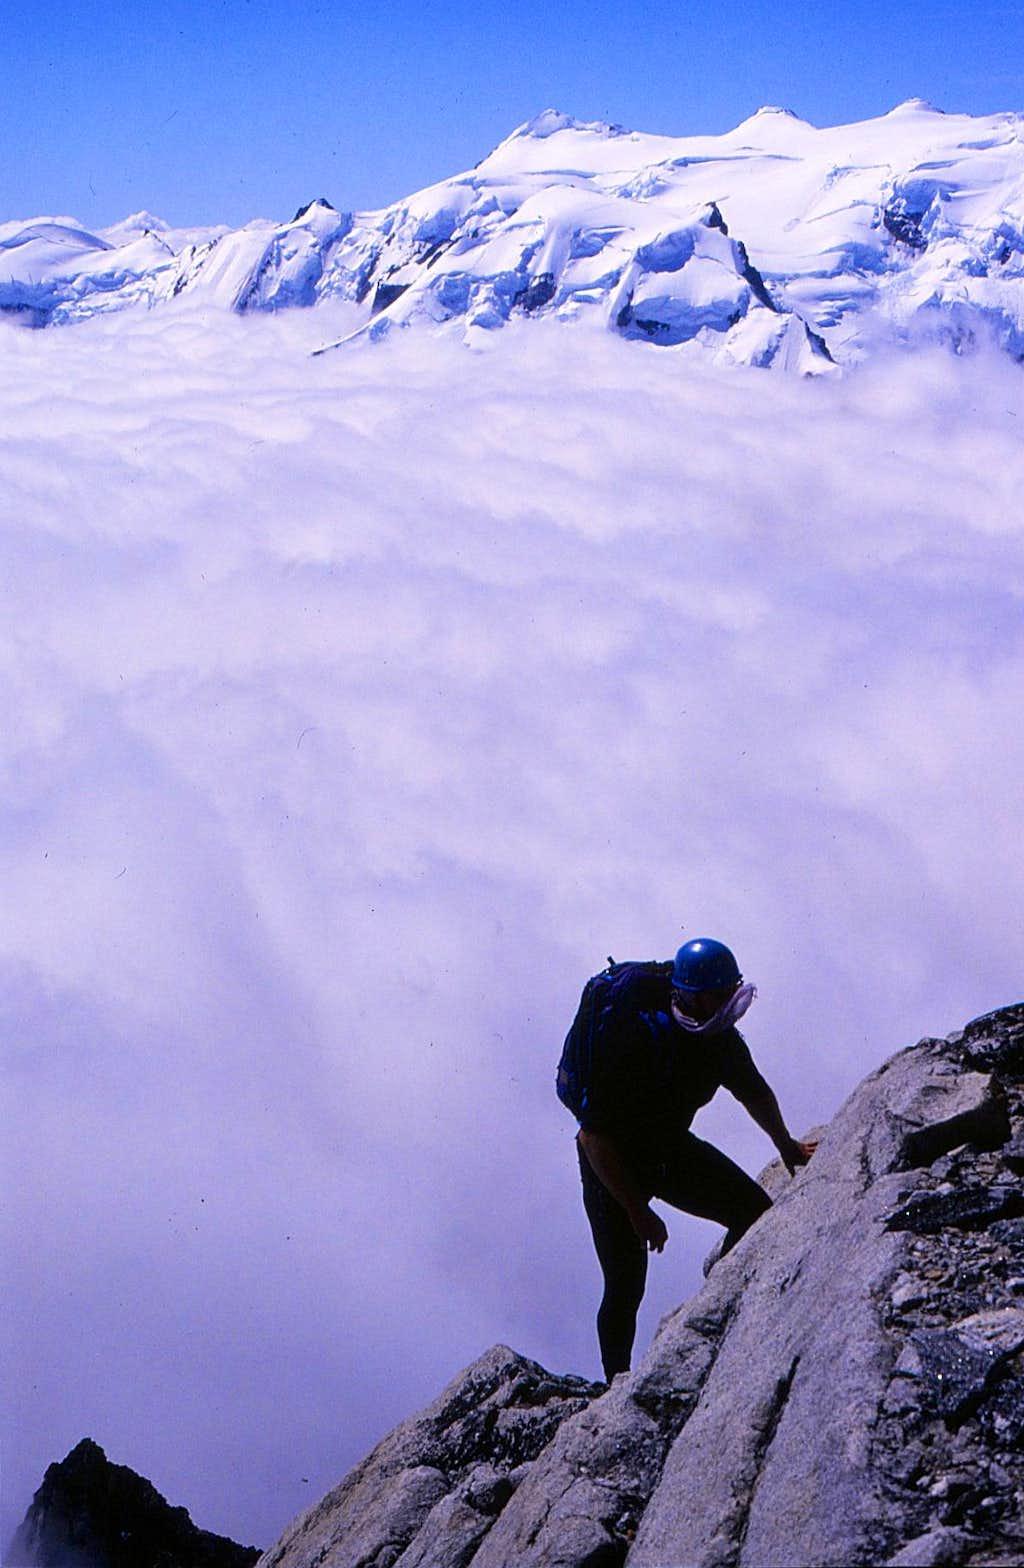 Climbing on Dentiform Peak across from Mt Waddington